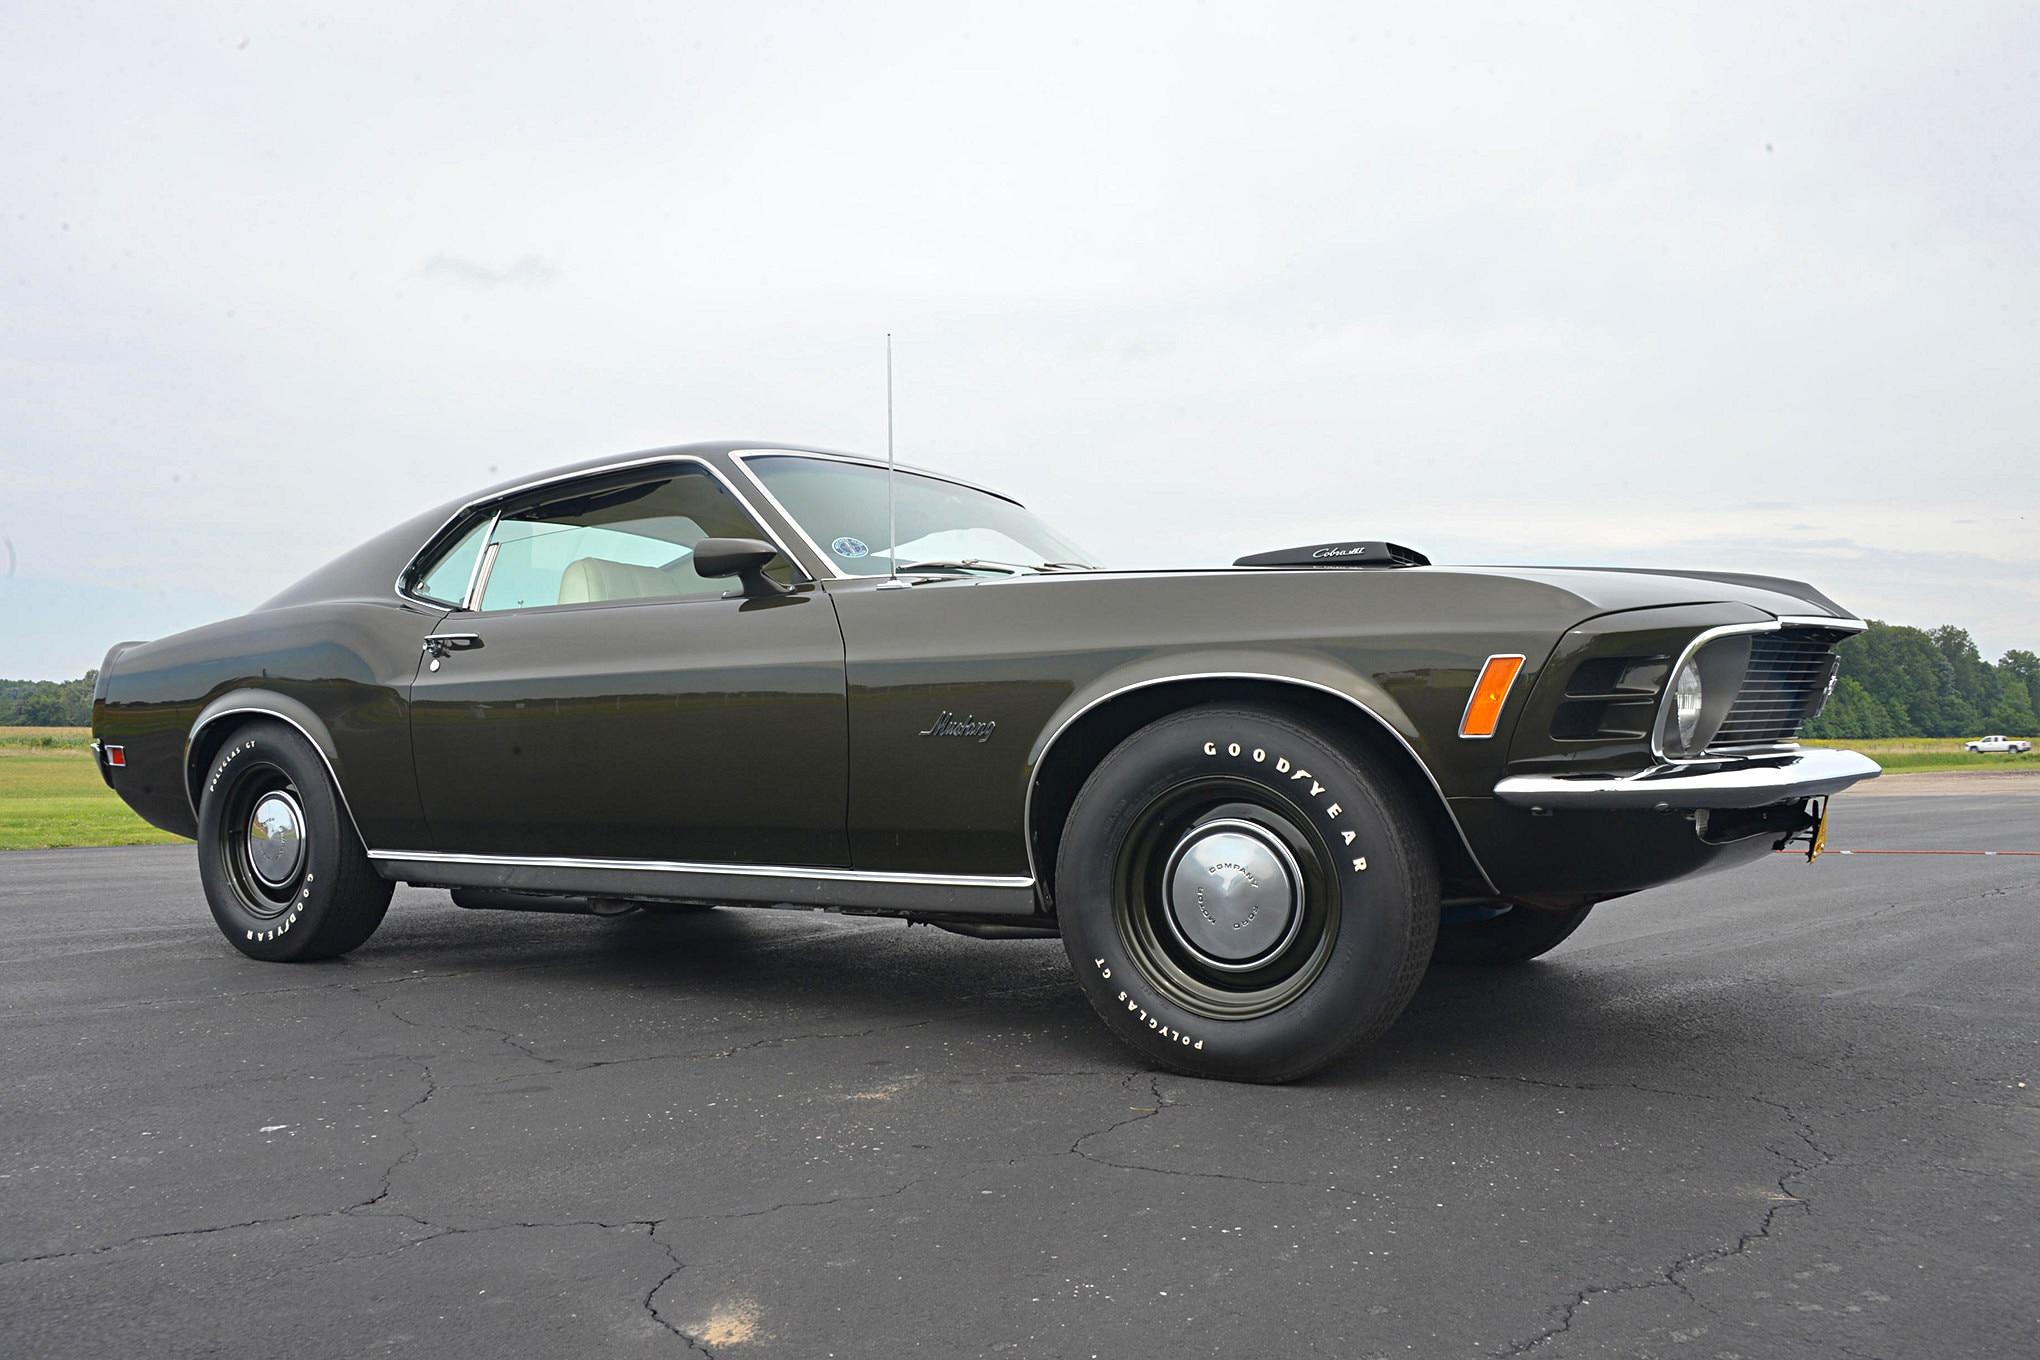 006 1970 CobraJet Fastback Goodie